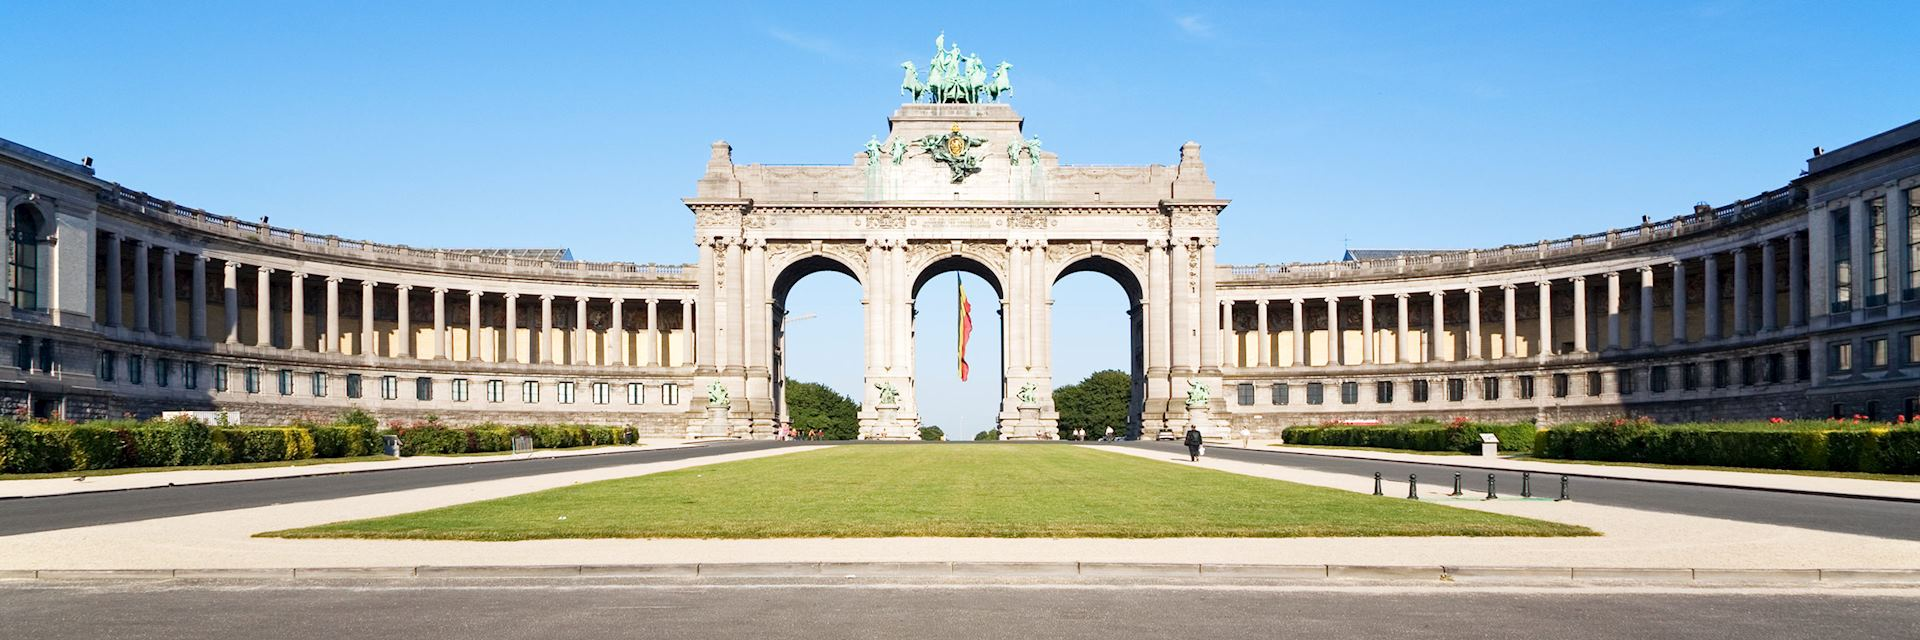 Triumphal Arch, Brussels